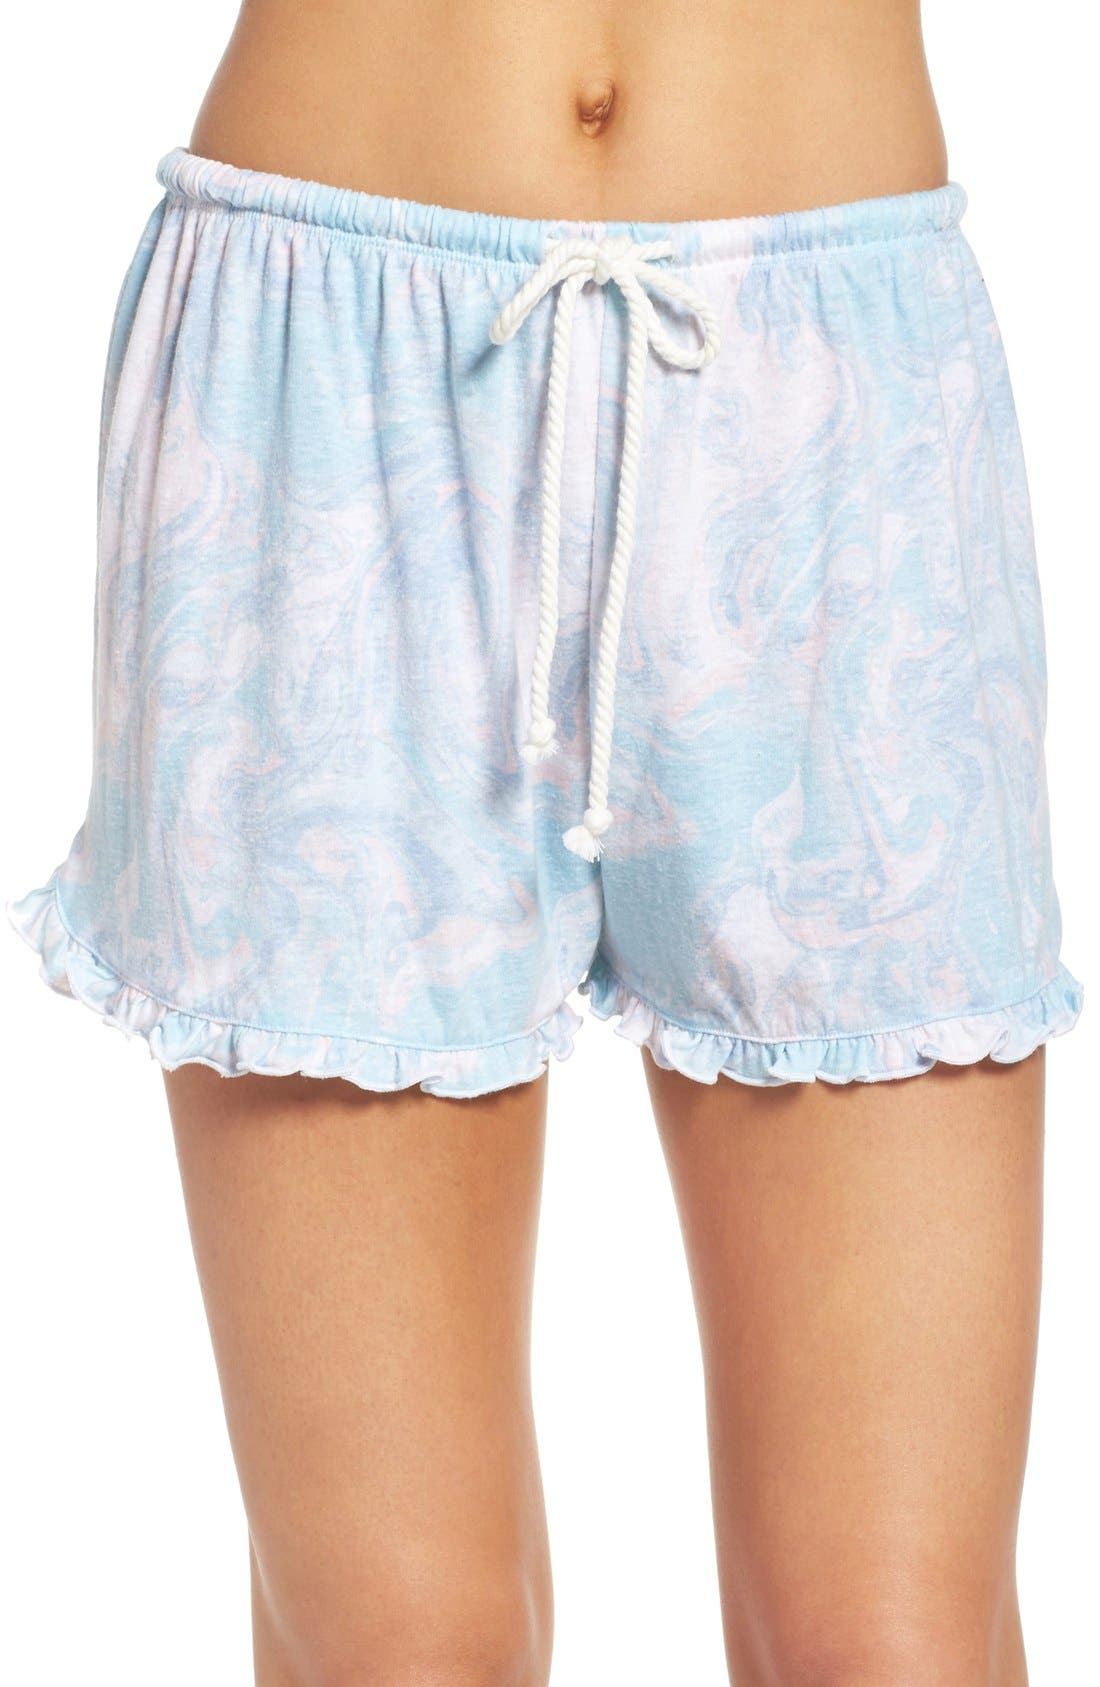 Main Image - Make + Model Ruffle Shorts